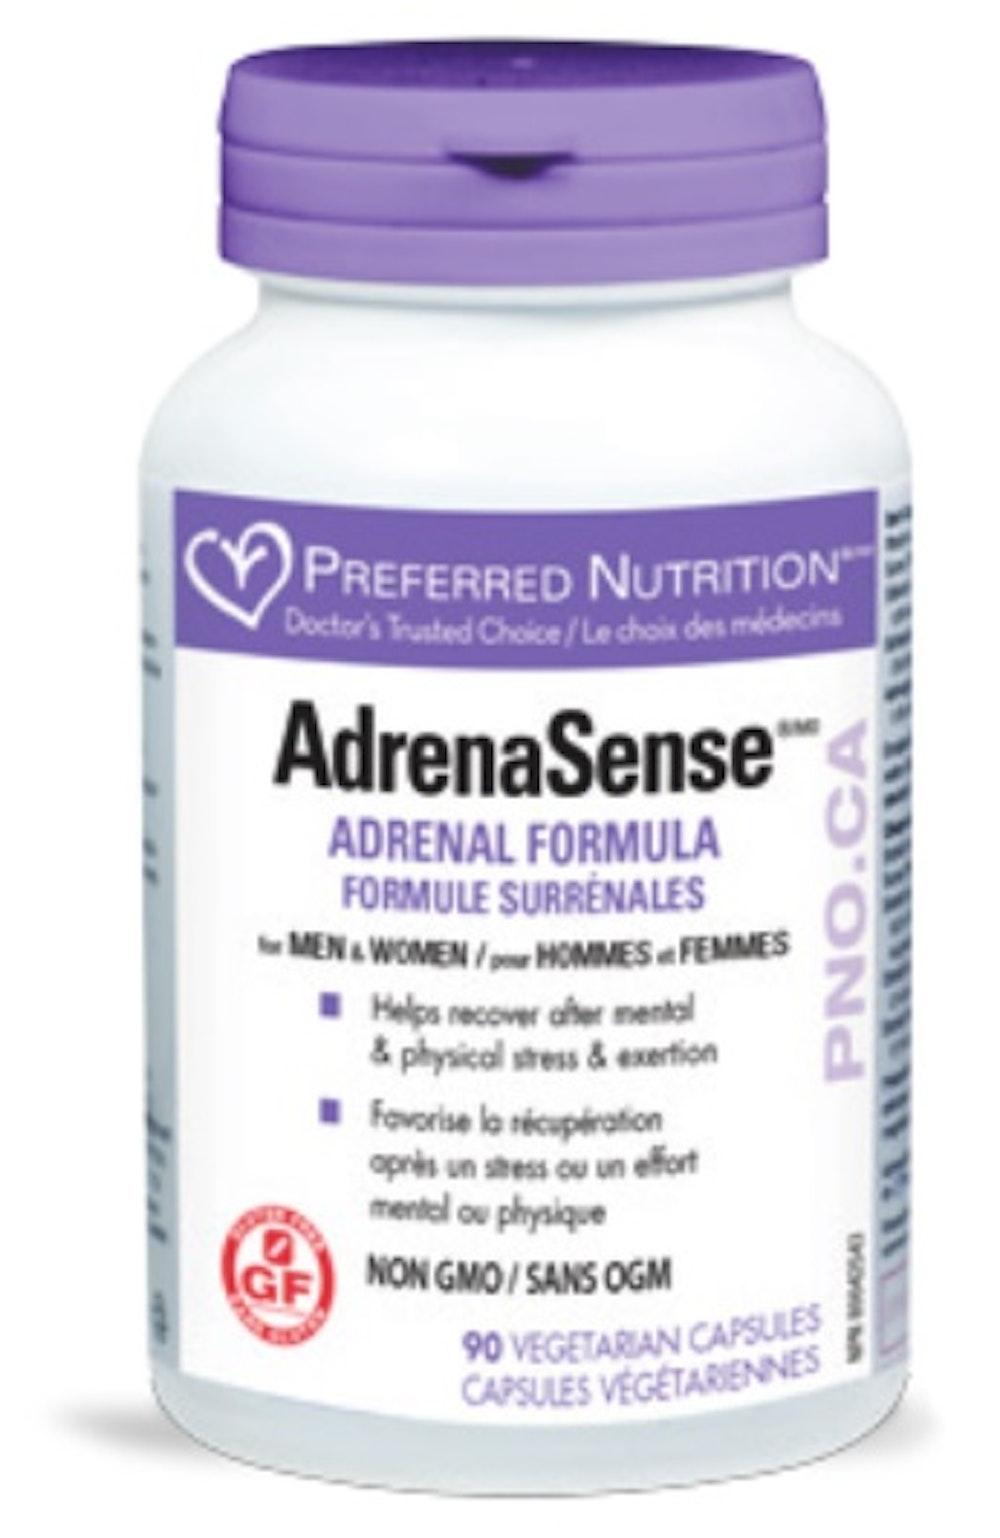 AdrenaSense